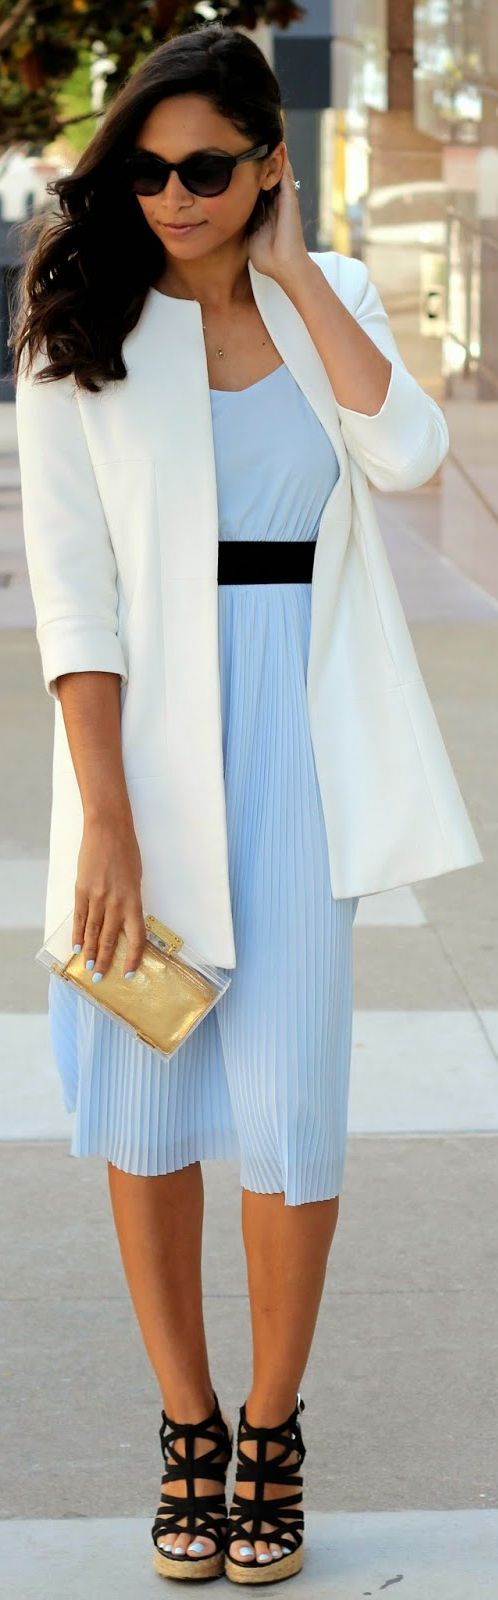 Zara Baby Blue Chiffon Black Waist Belt Pleated Skirt Midi Summer Dress